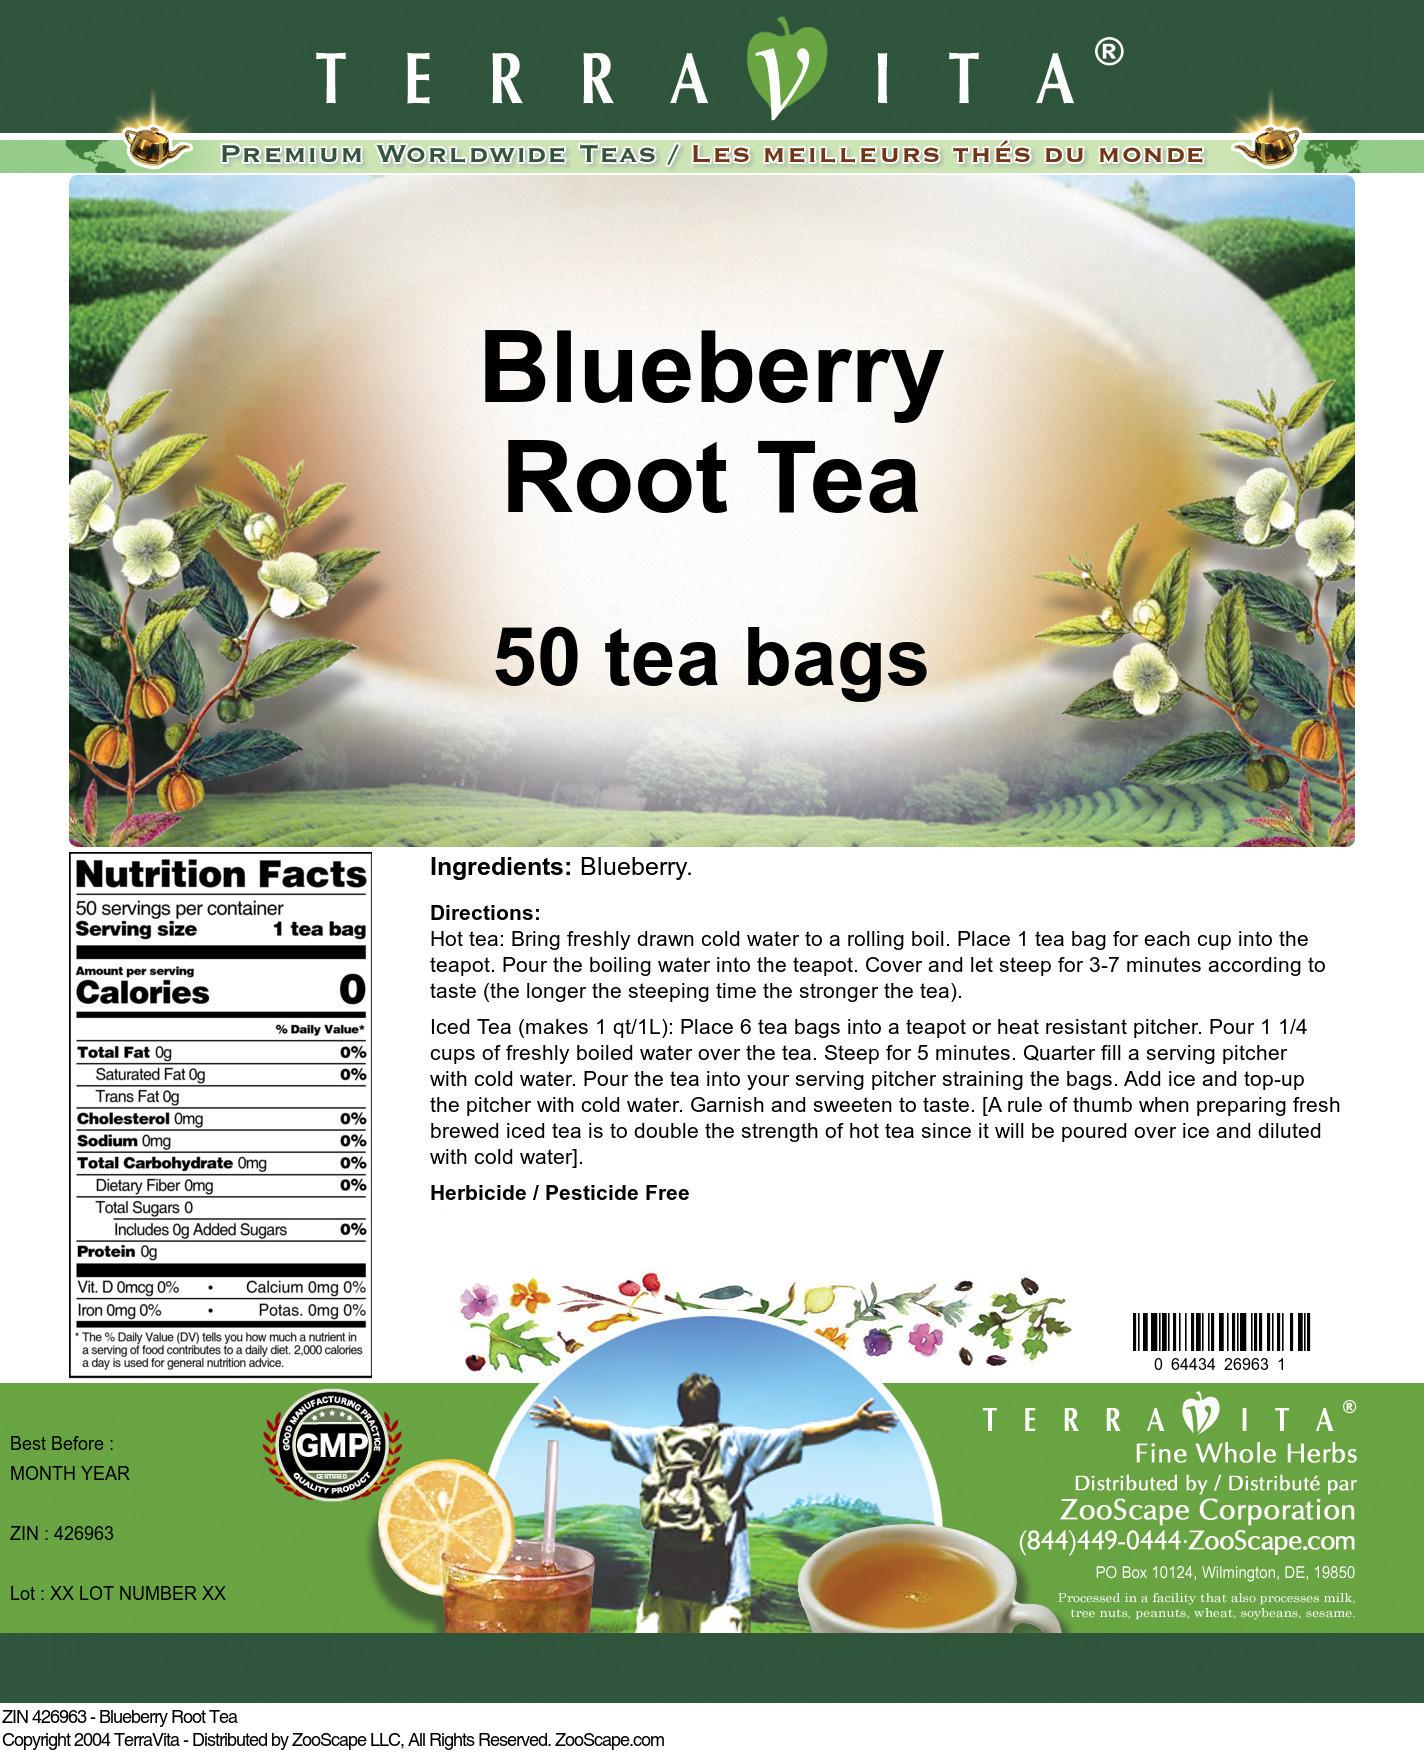 Blueberry Root Tea